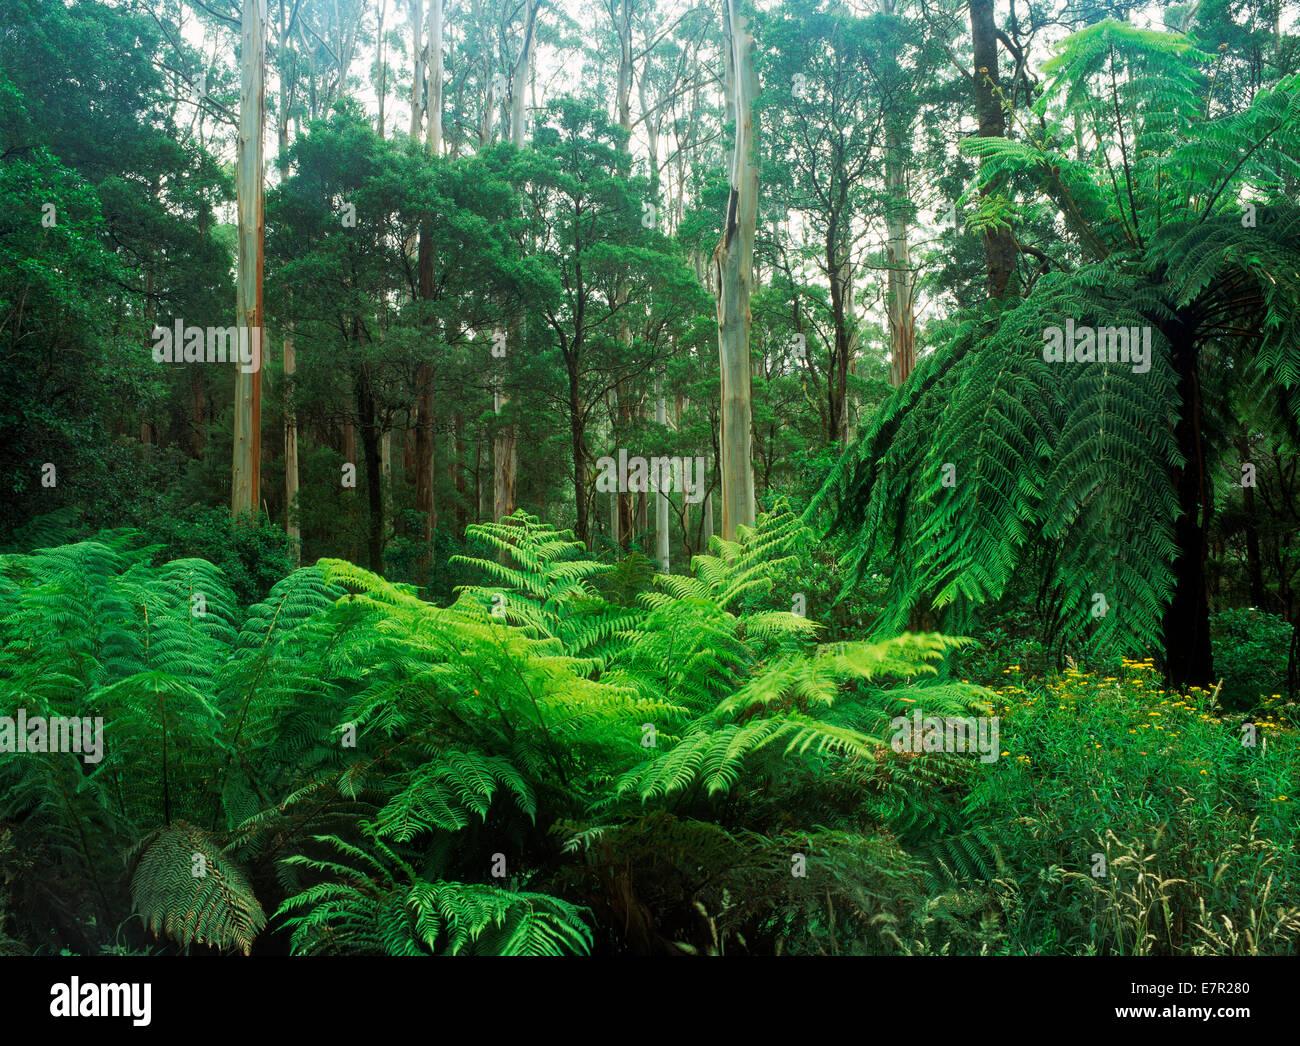 Swamp Gum (Eucalyptus regnans) in Tasmania, Australia Stock Photo